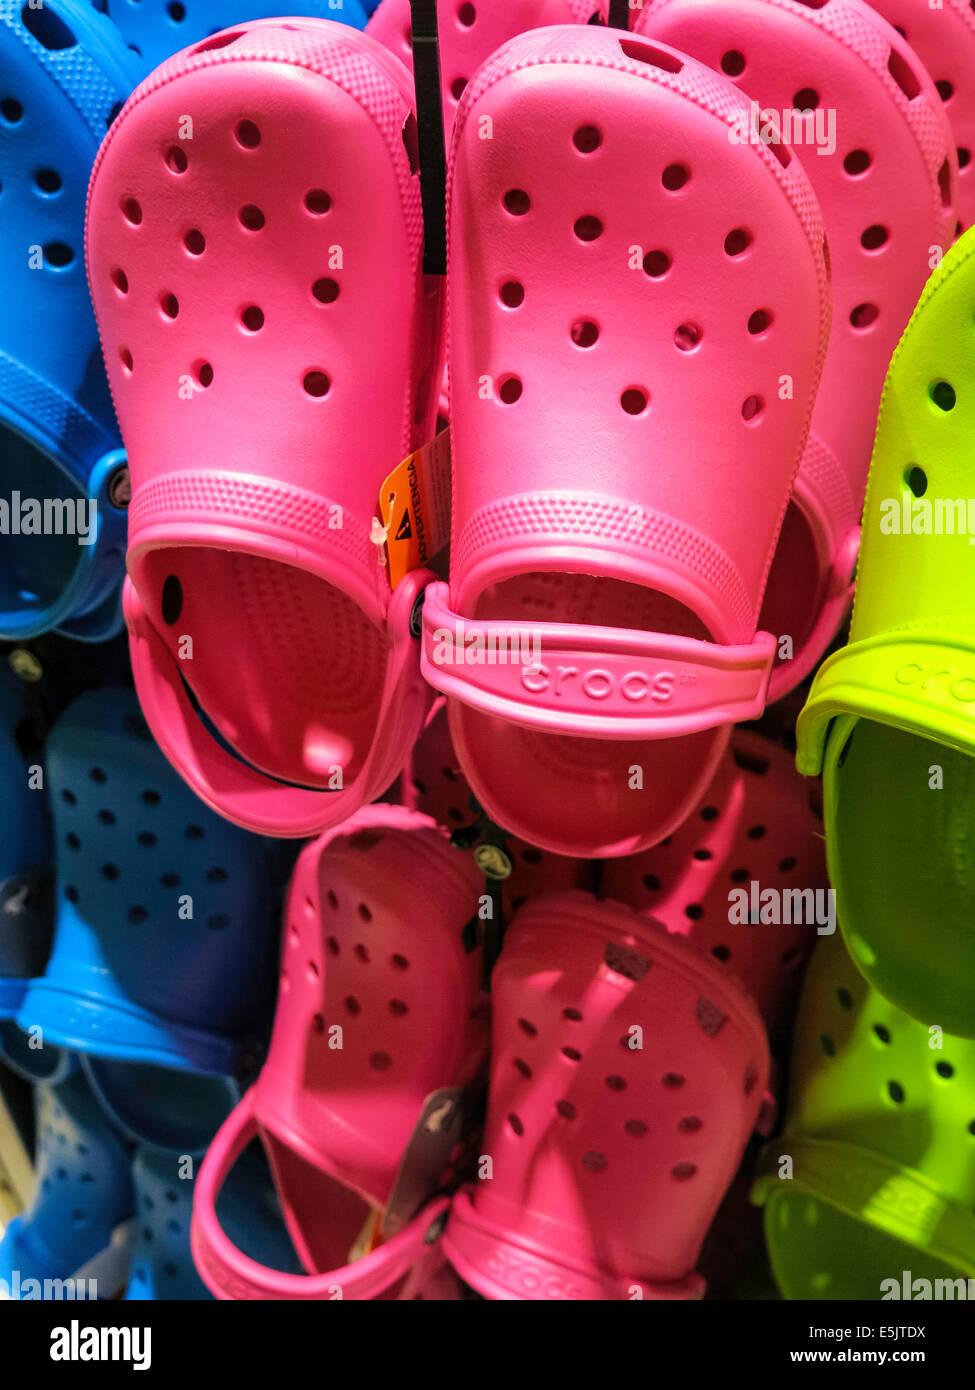 5fc18a9b2 Crocs Synthetic Foam Shoe Store at 152 West 34th Street